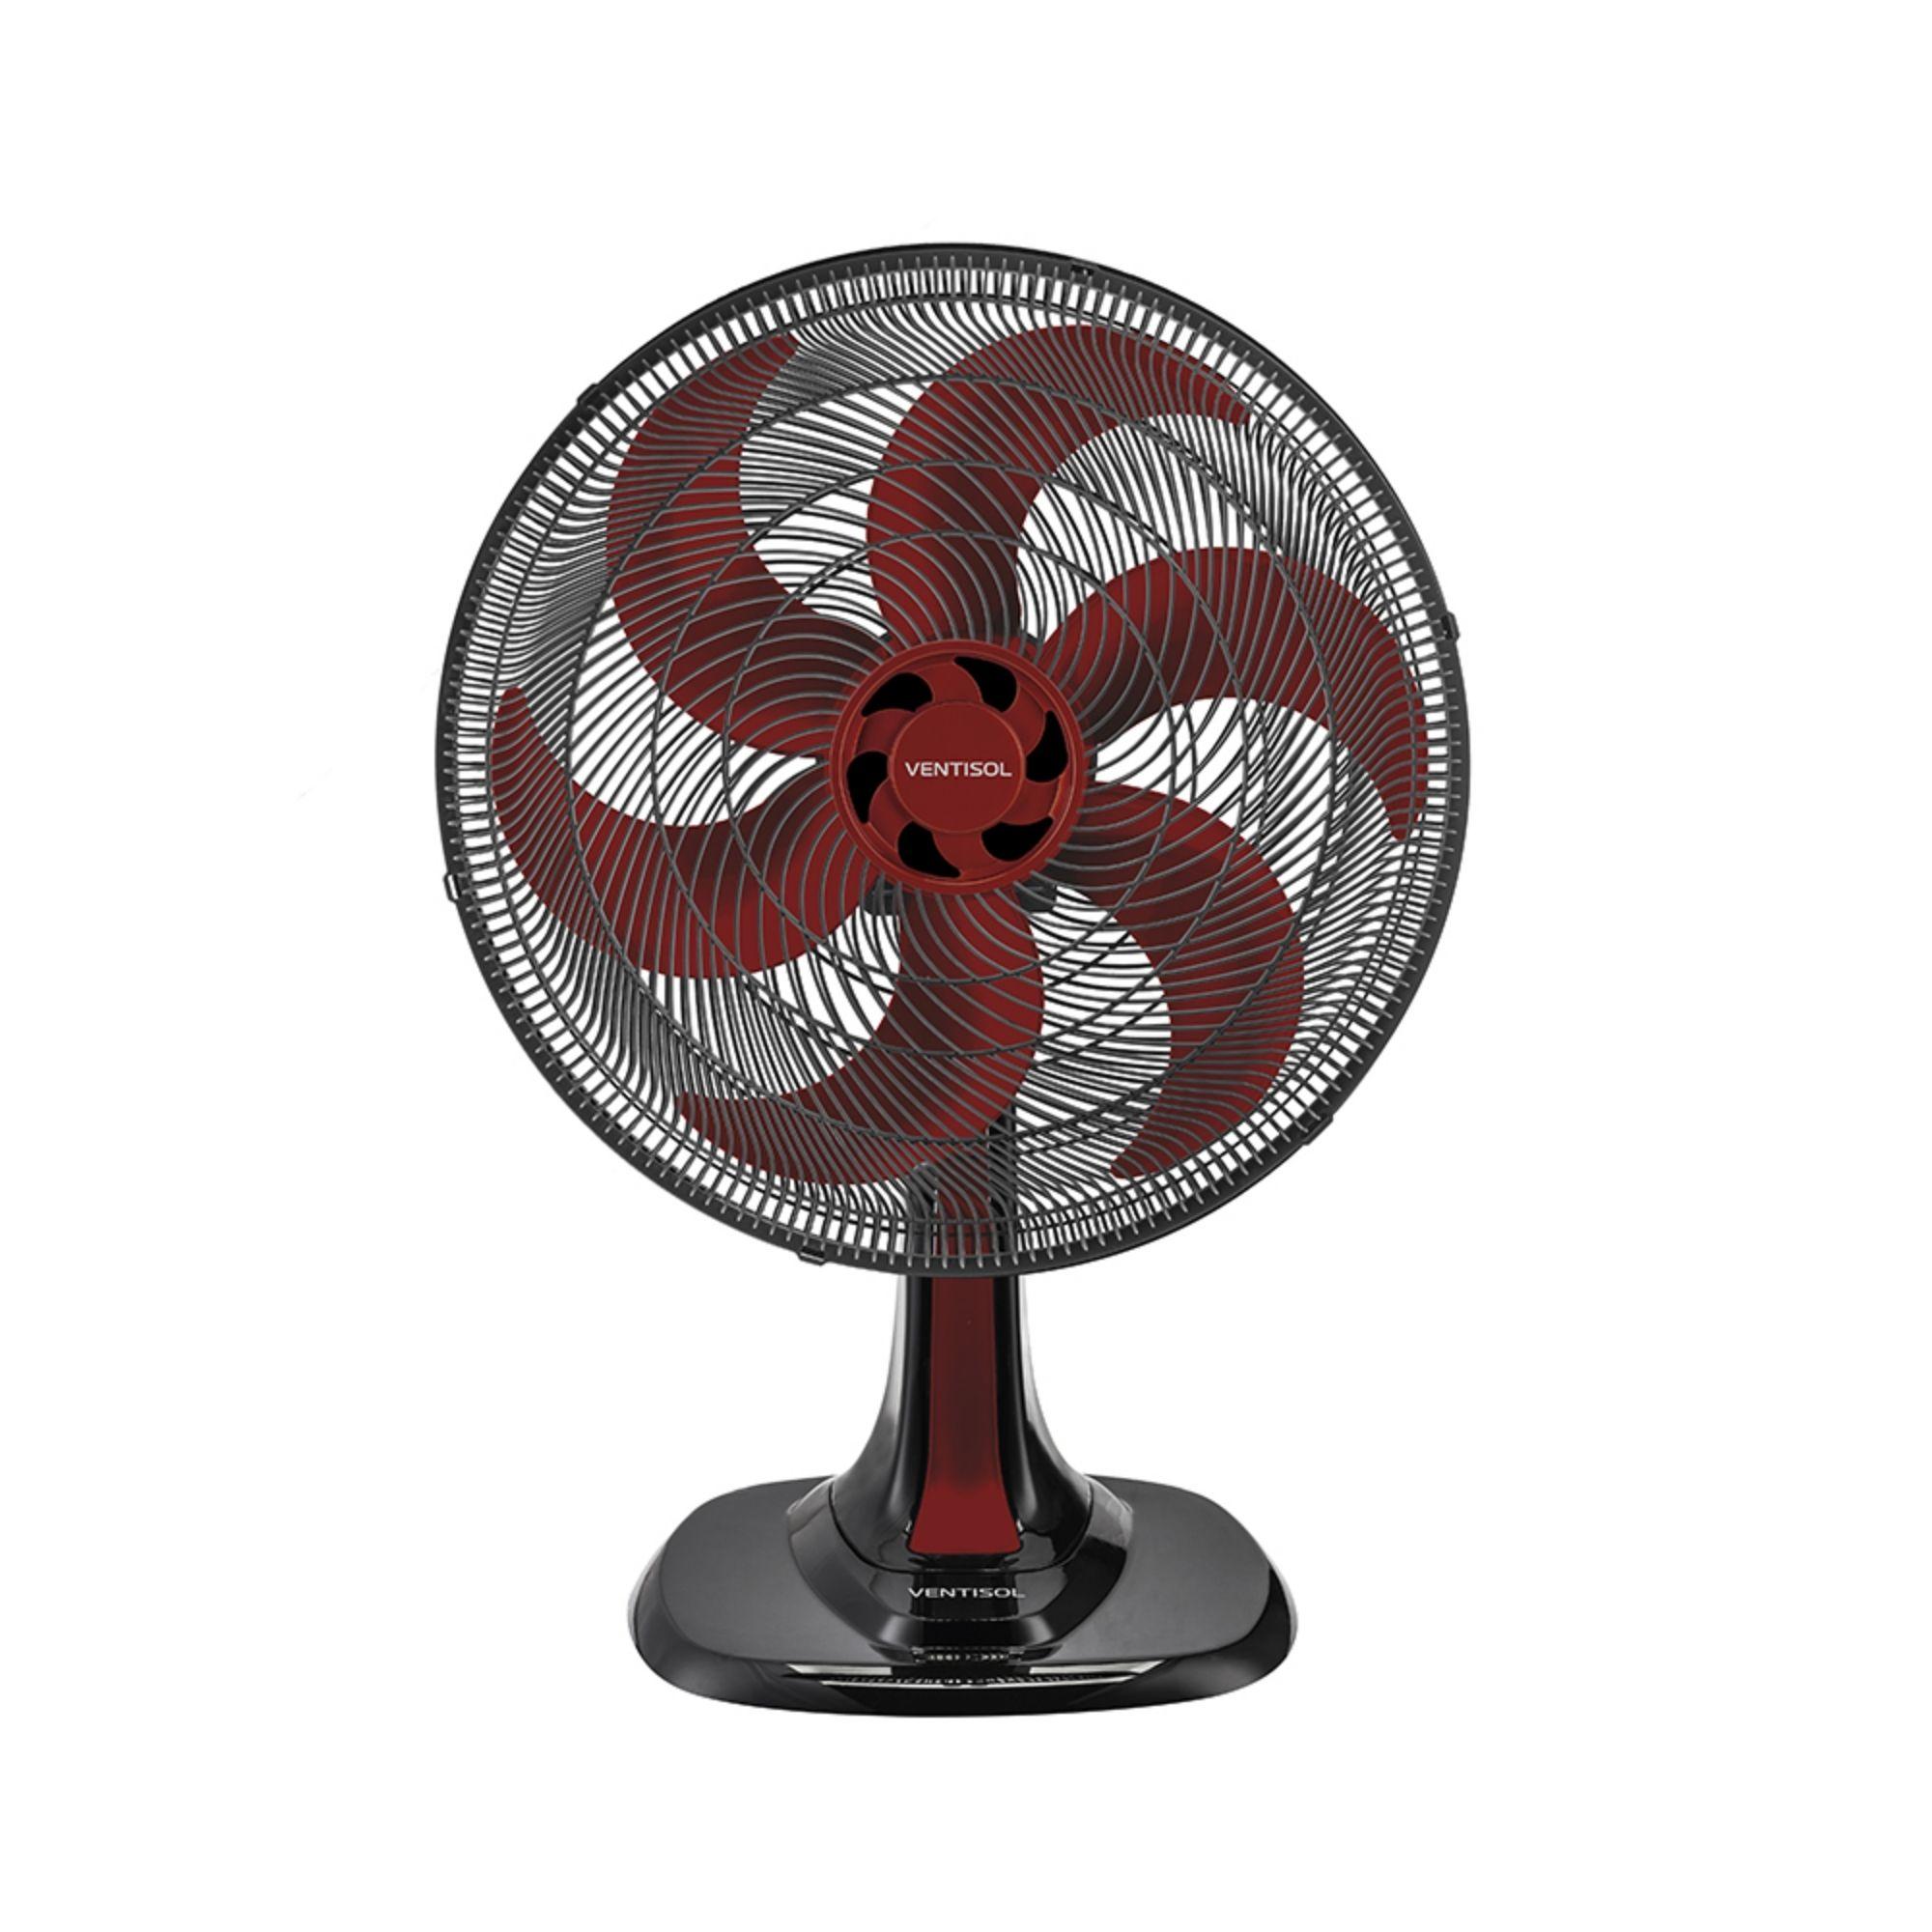 Ventisol Ventilador de Mesa 40cm 127v Vermelho Premium 6 Pás